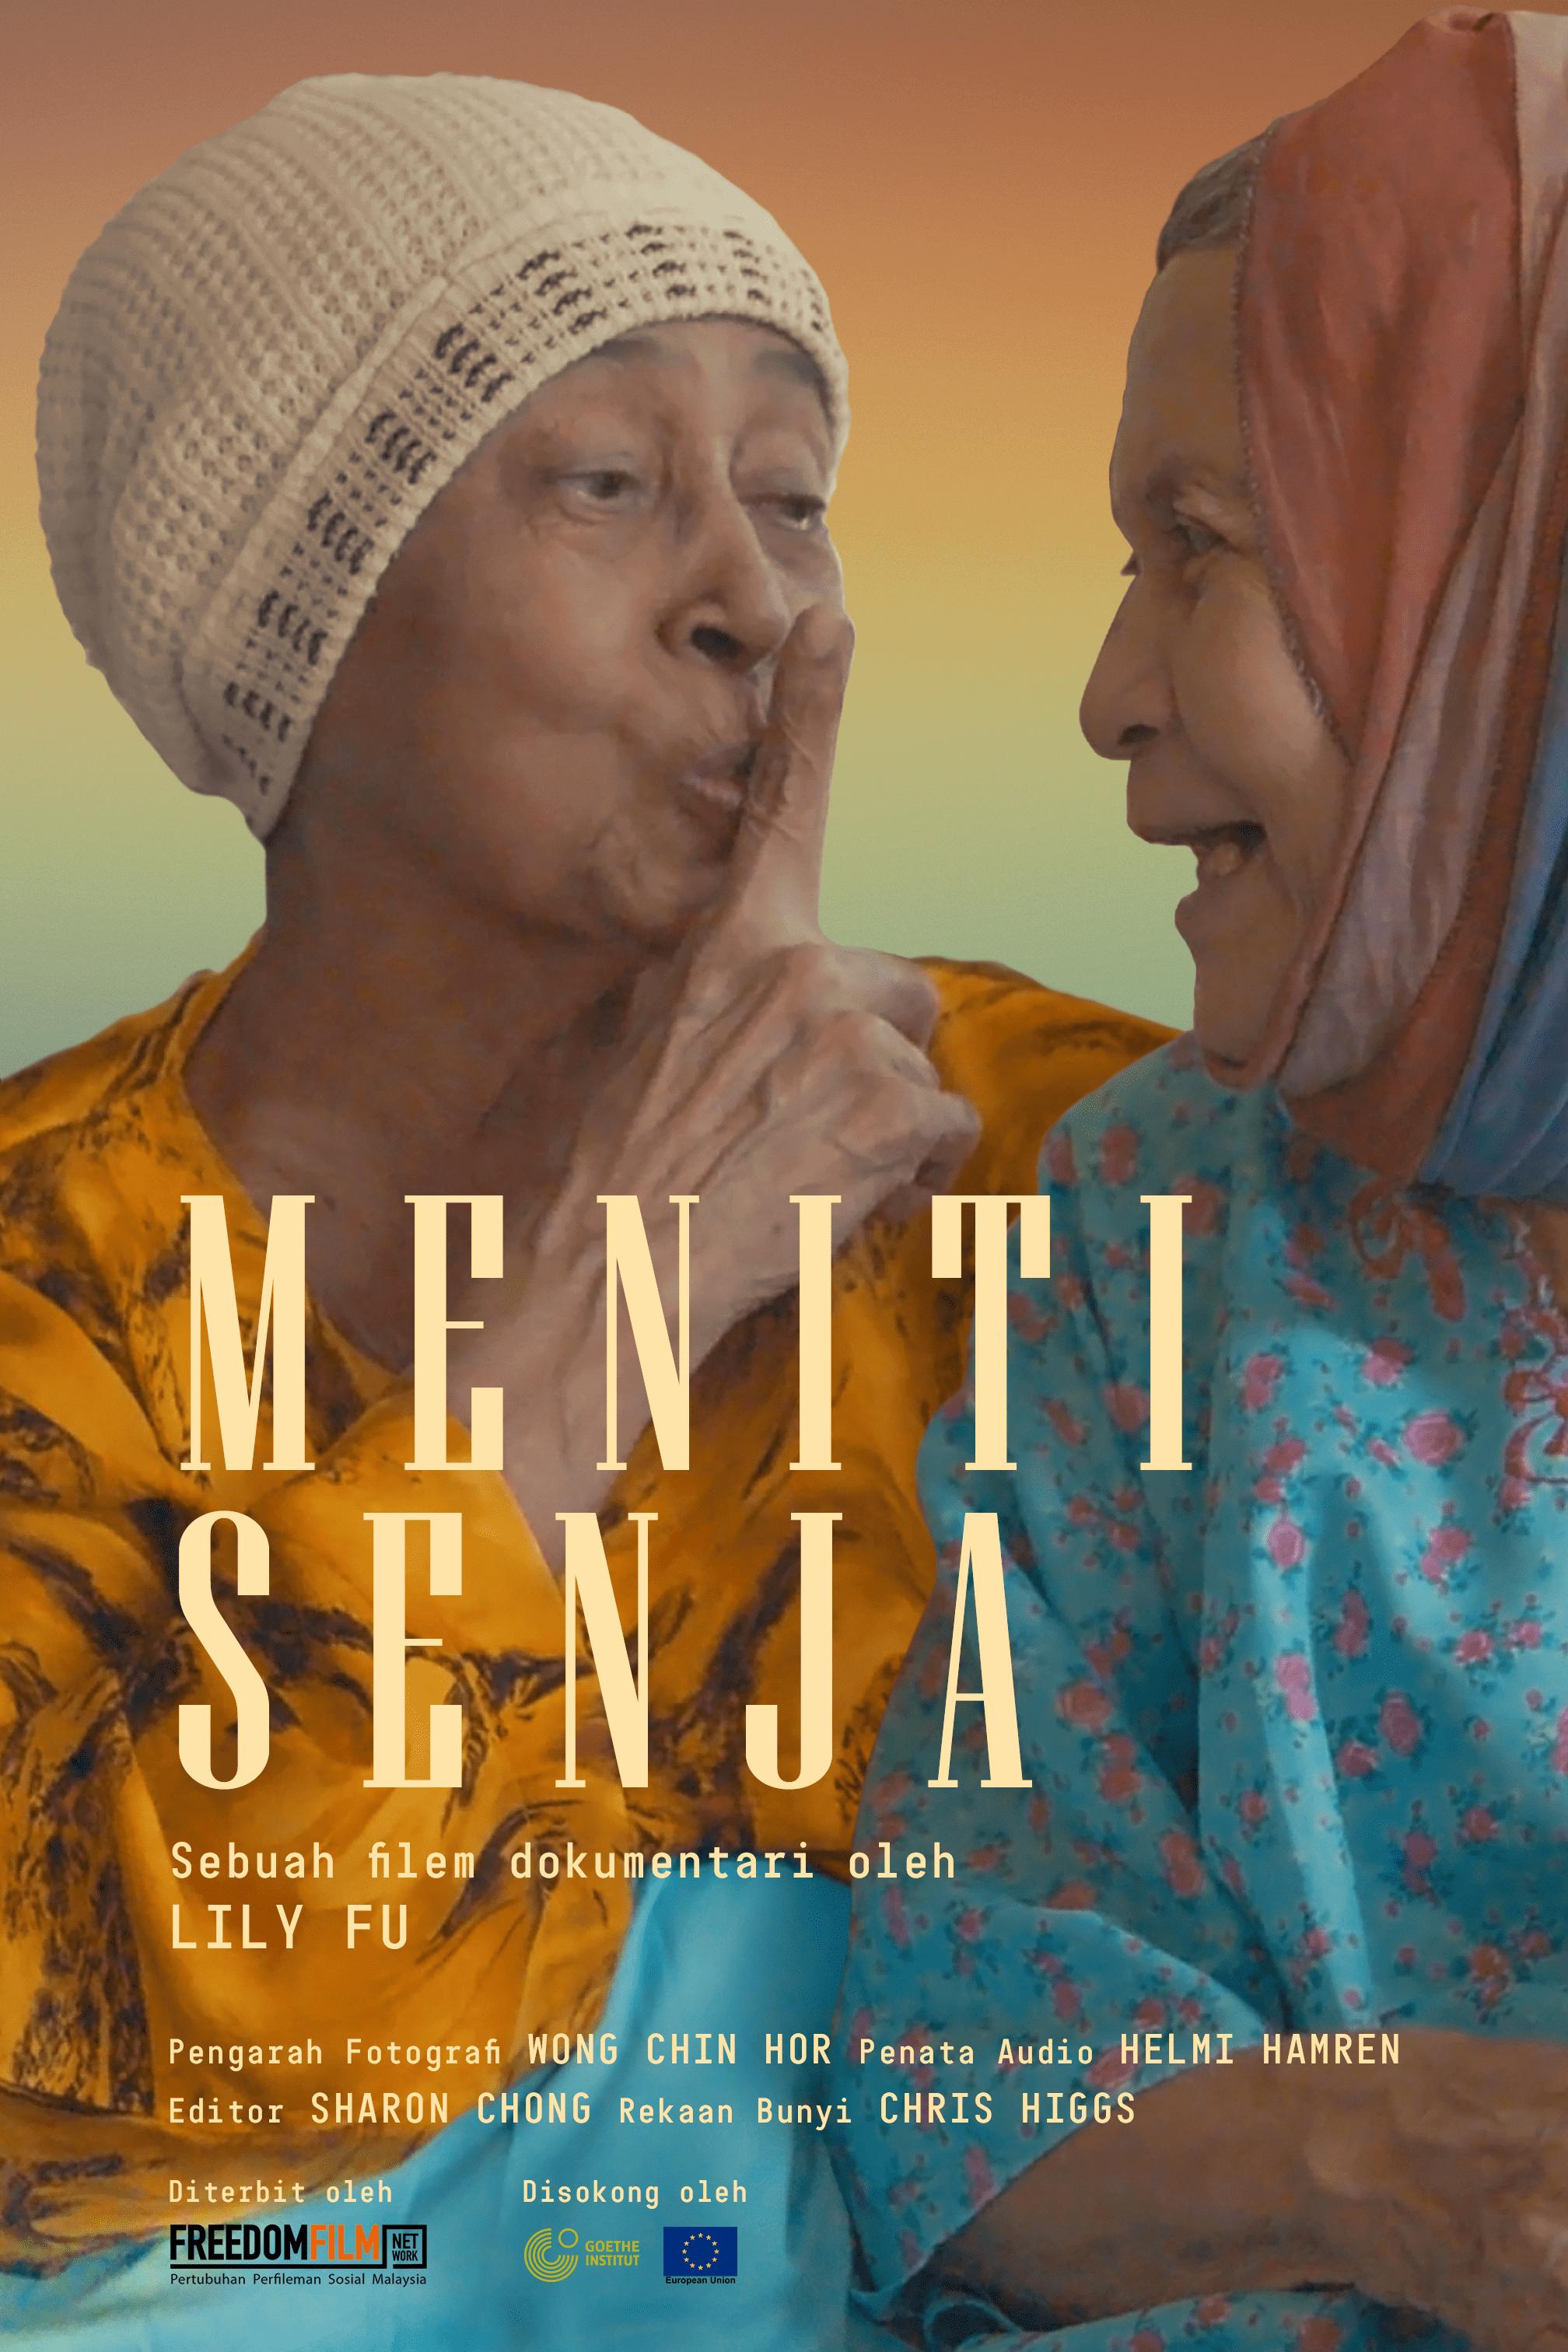 Meniti Senja / The Twilight Years by Lily Fu